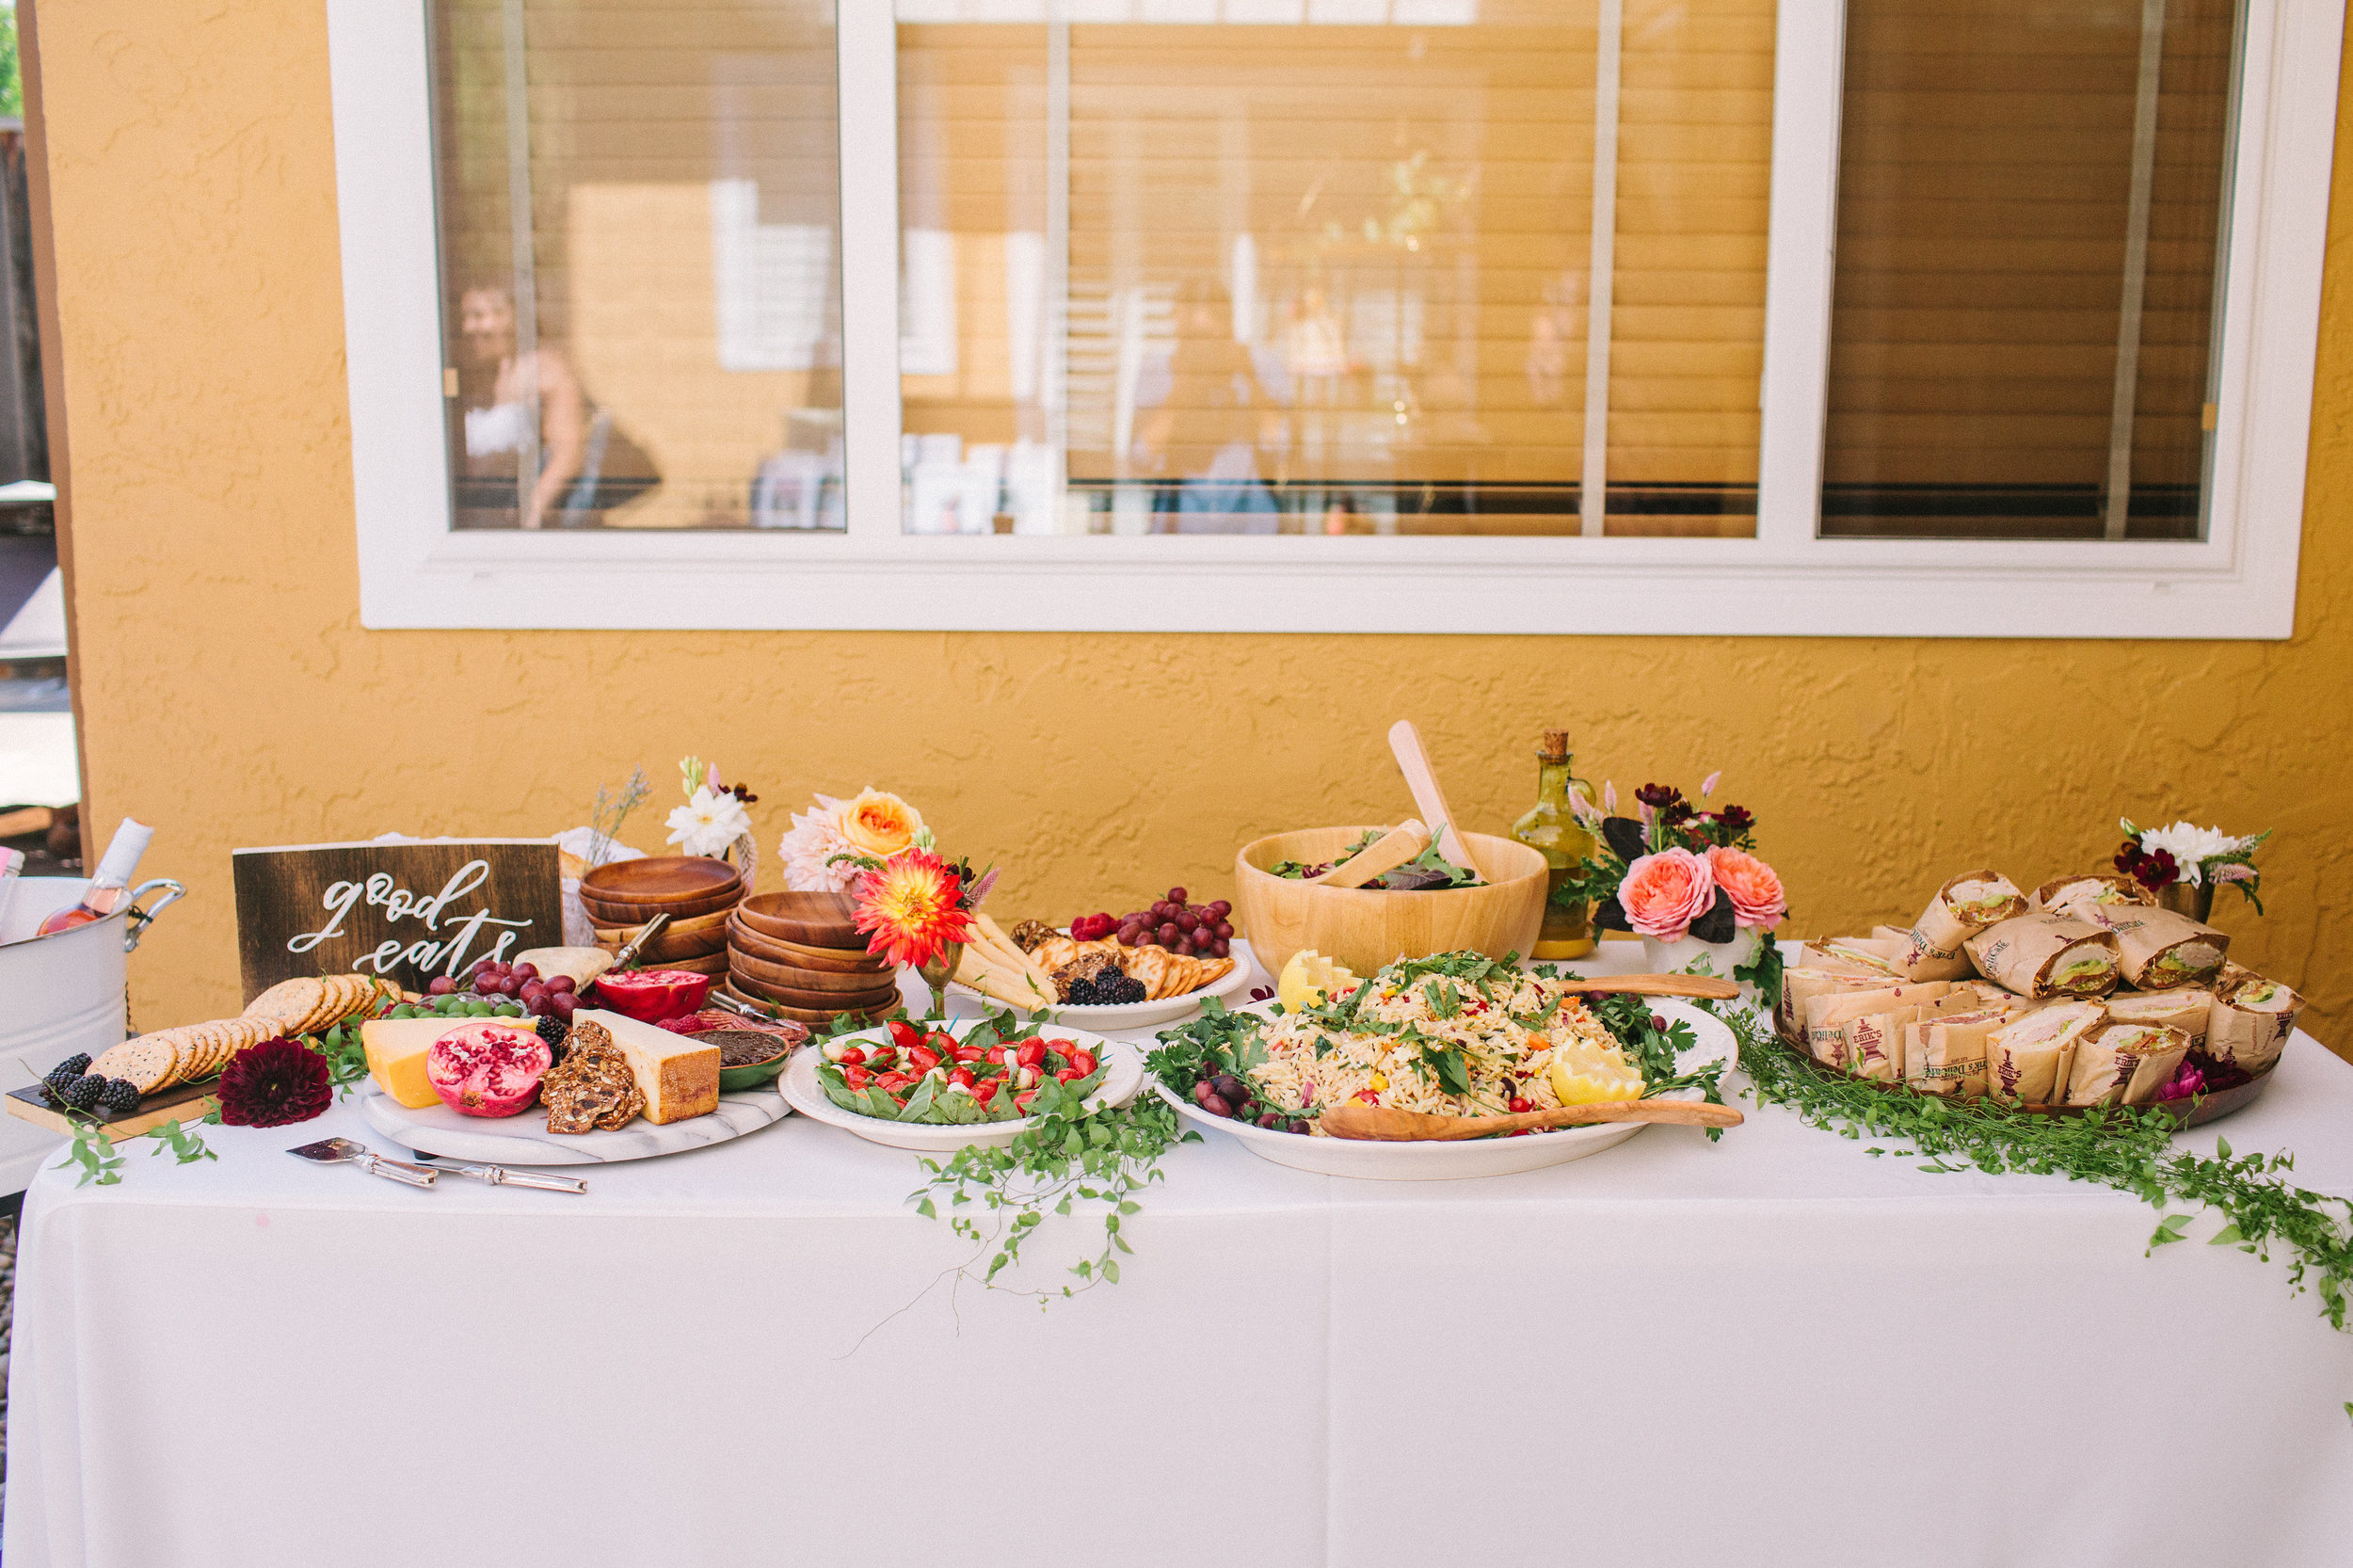 Bridal shower lunch spread